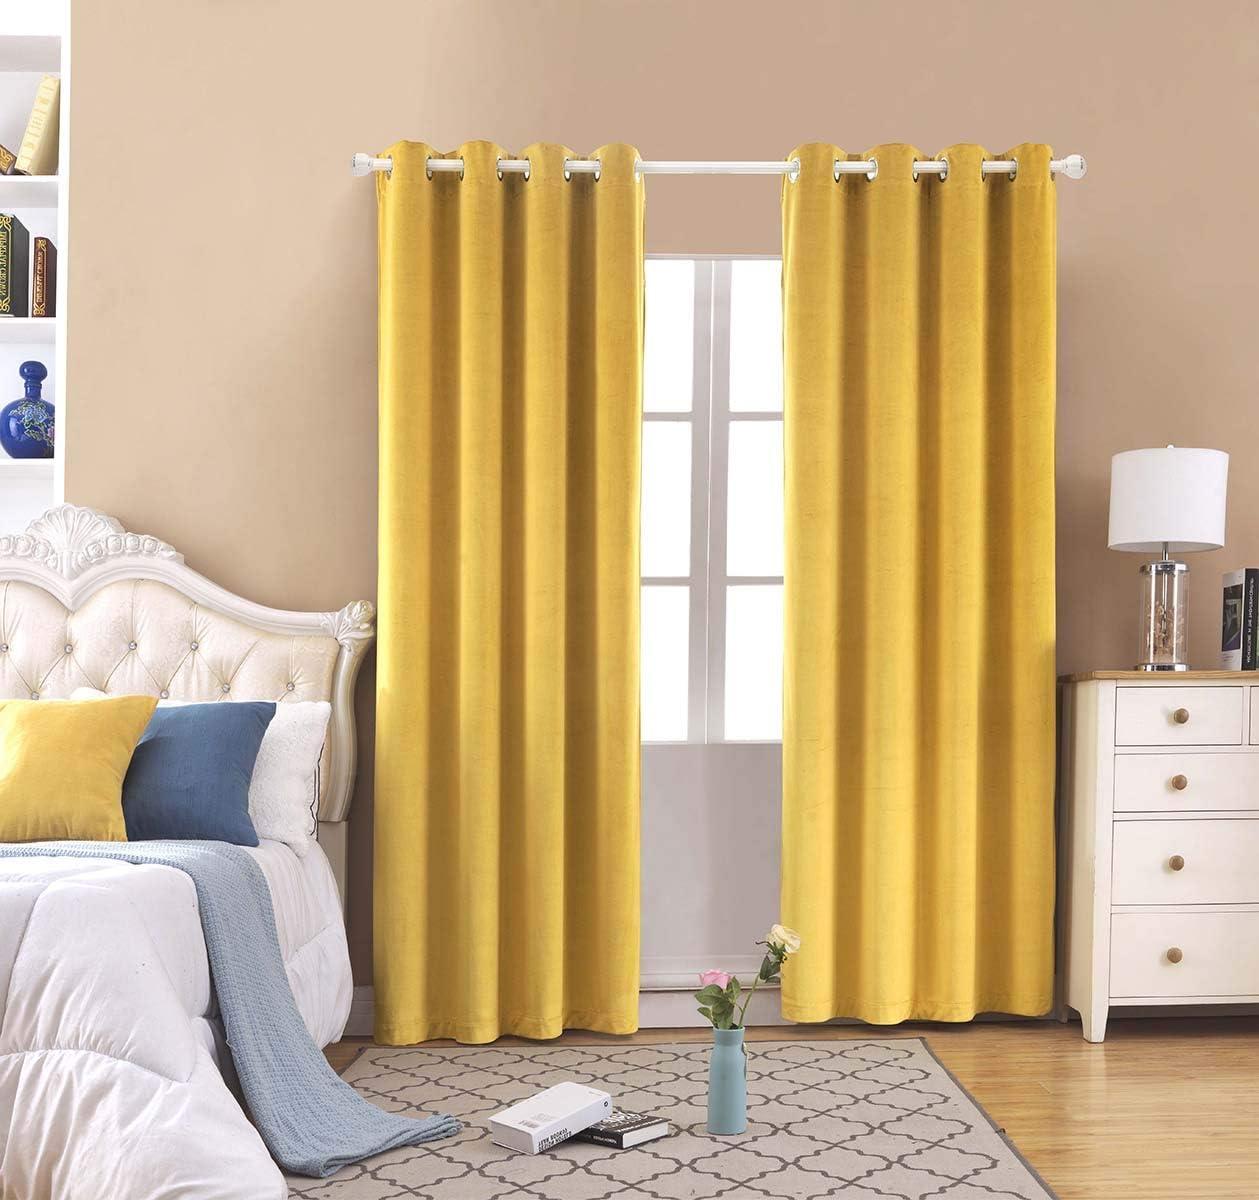 FengChang Blackout Velvet Curtains Yellow Soft Luxury Drapes Window Treatment 2 Panels Yellow, L52 X W108